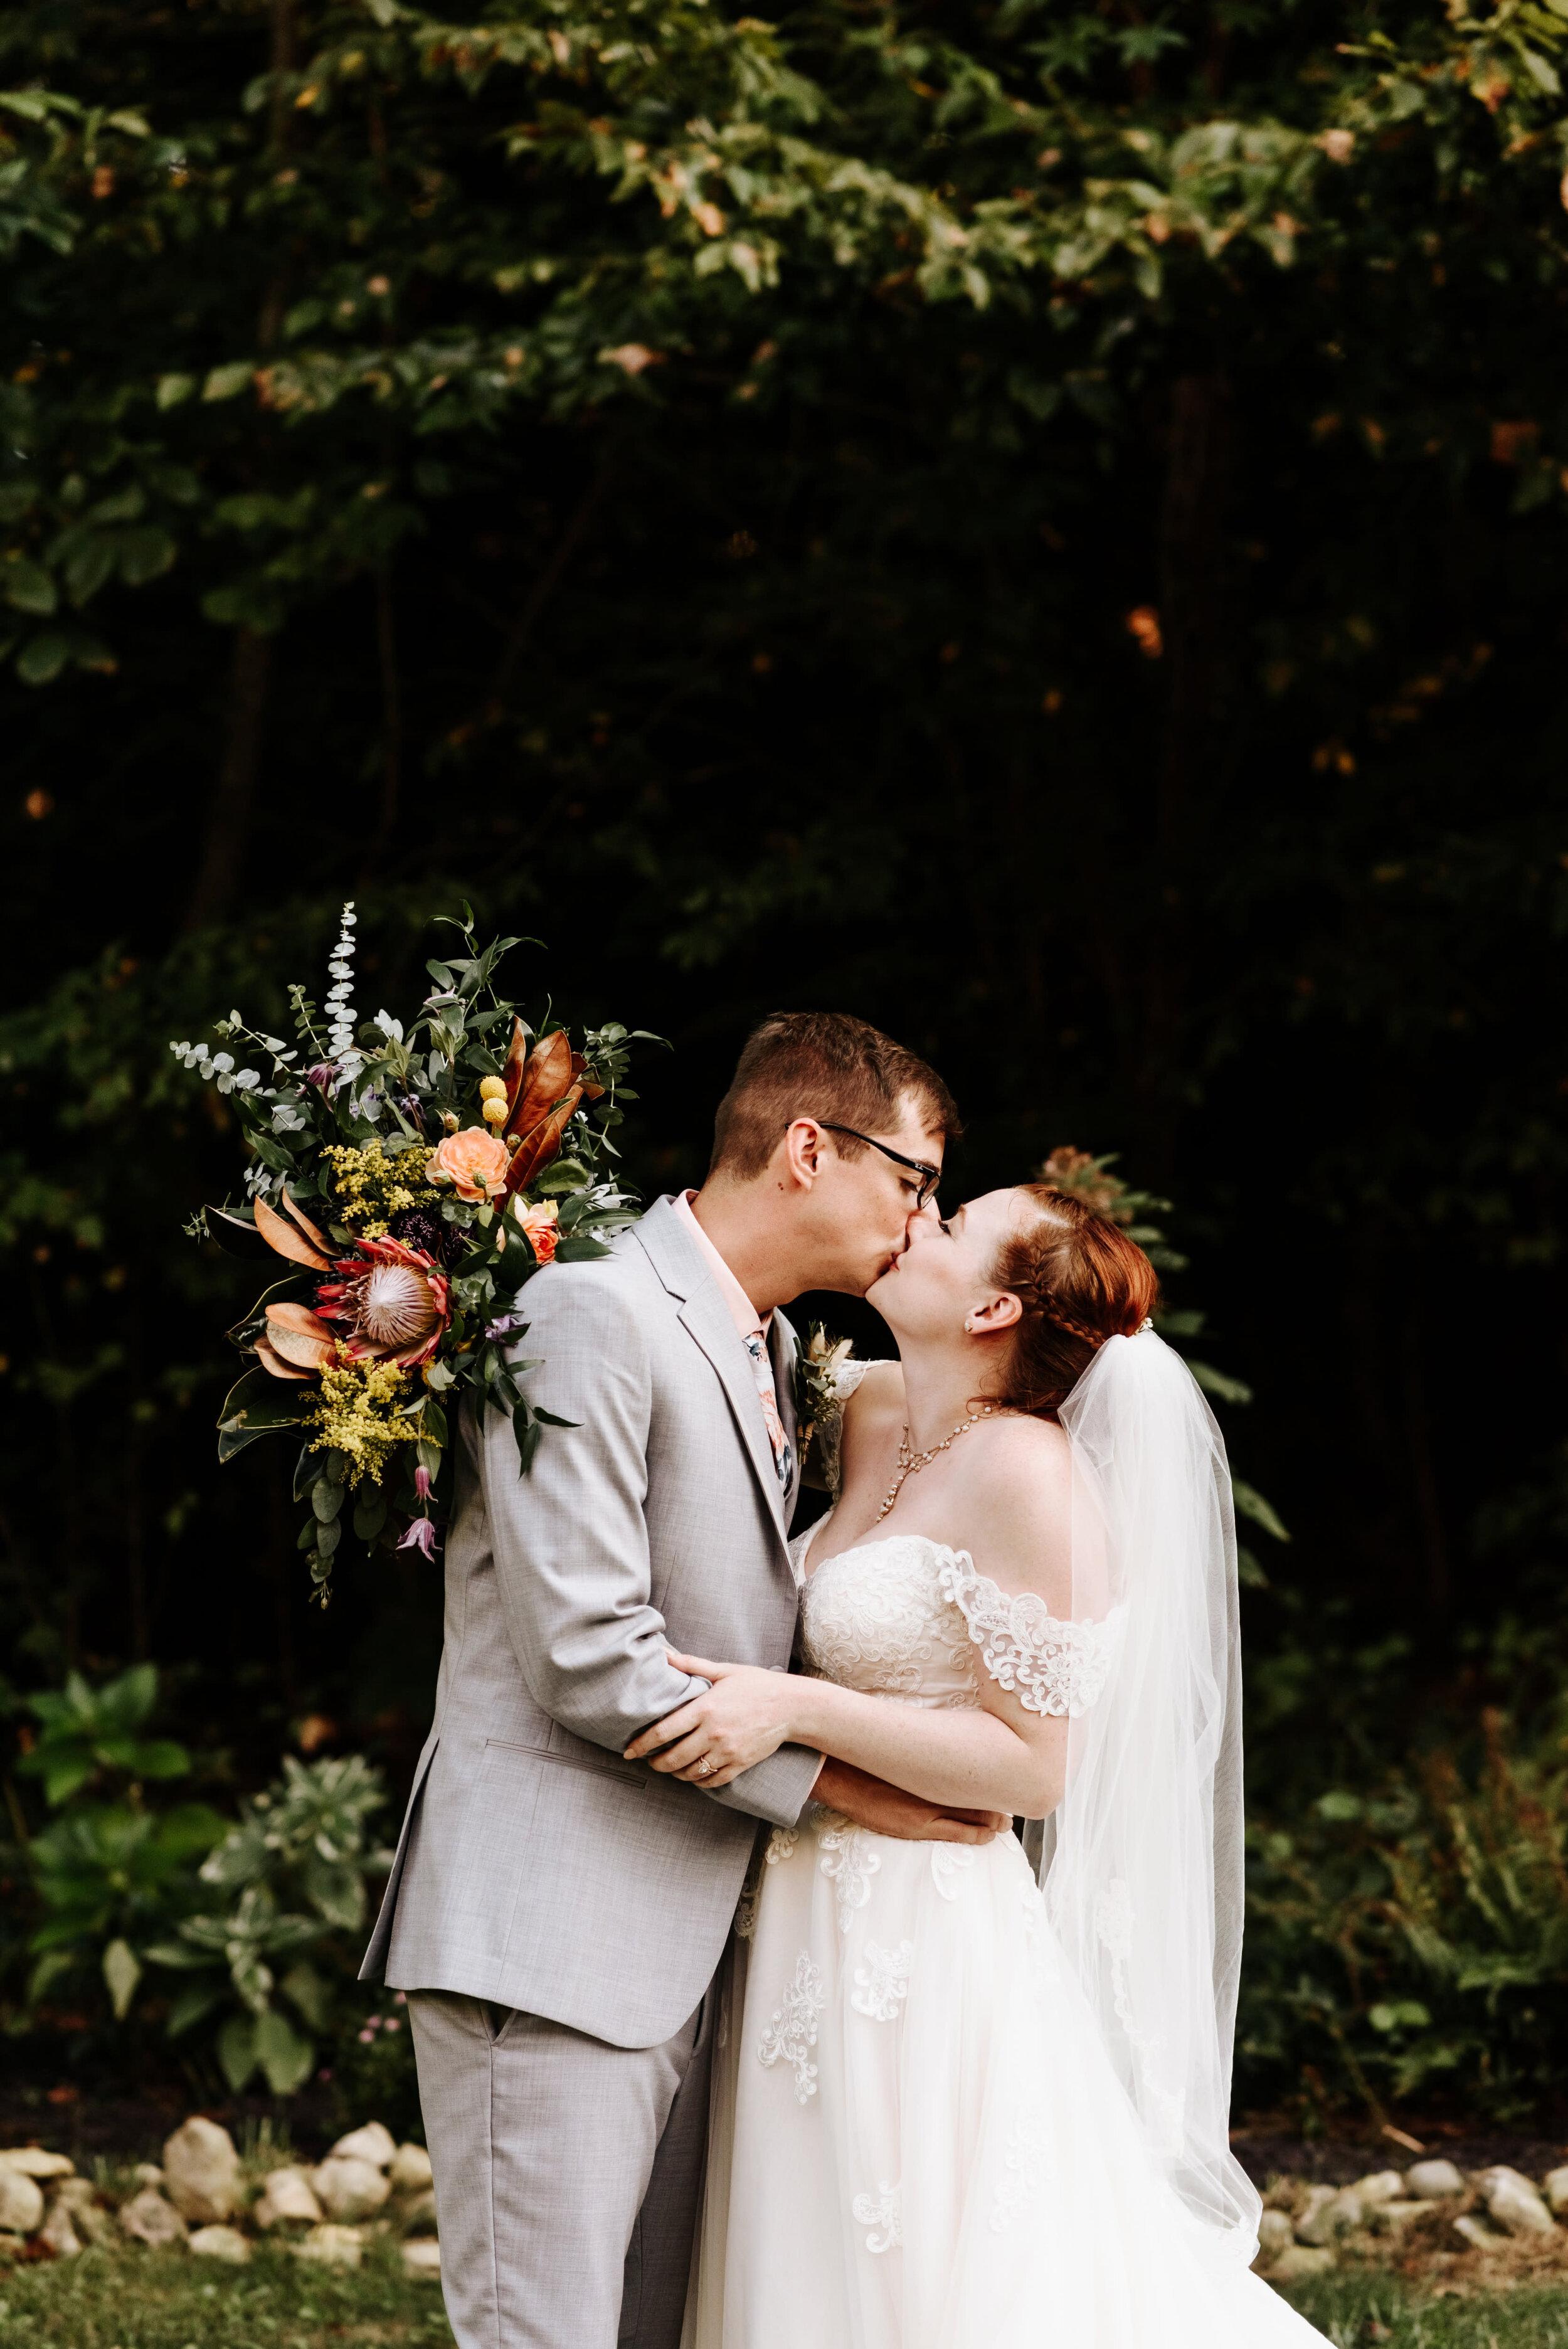 Rachel_David_Wedding_Richmond_Virginia_Photography_by_V_46.jpg